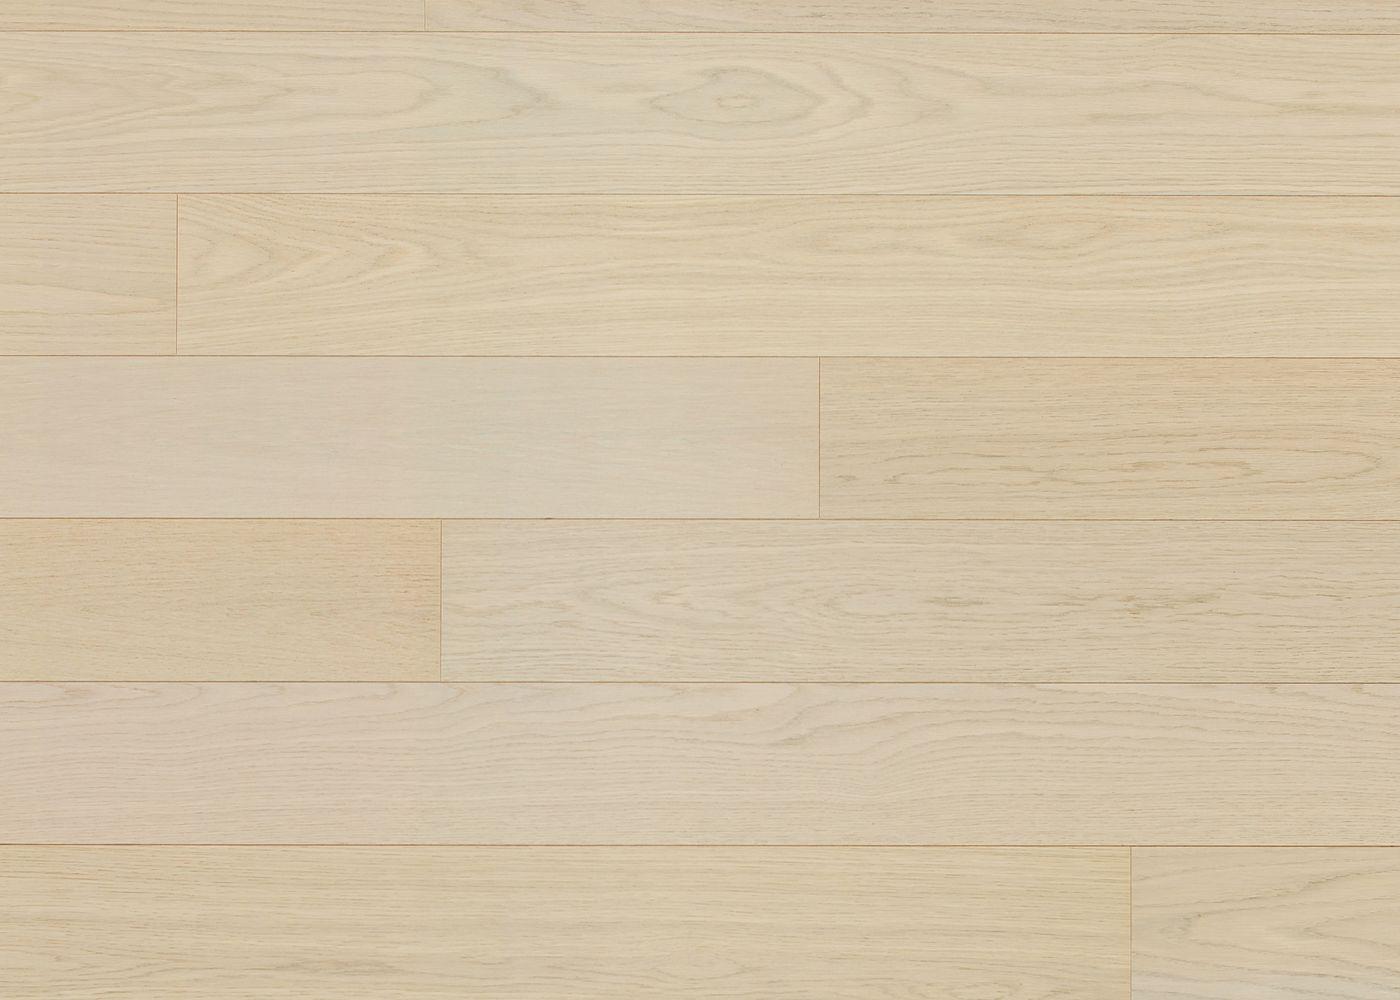 Sol plaqué bois Chêne ODESSSA brossé vernis extra-mat - Pro - Select 7x190x1203